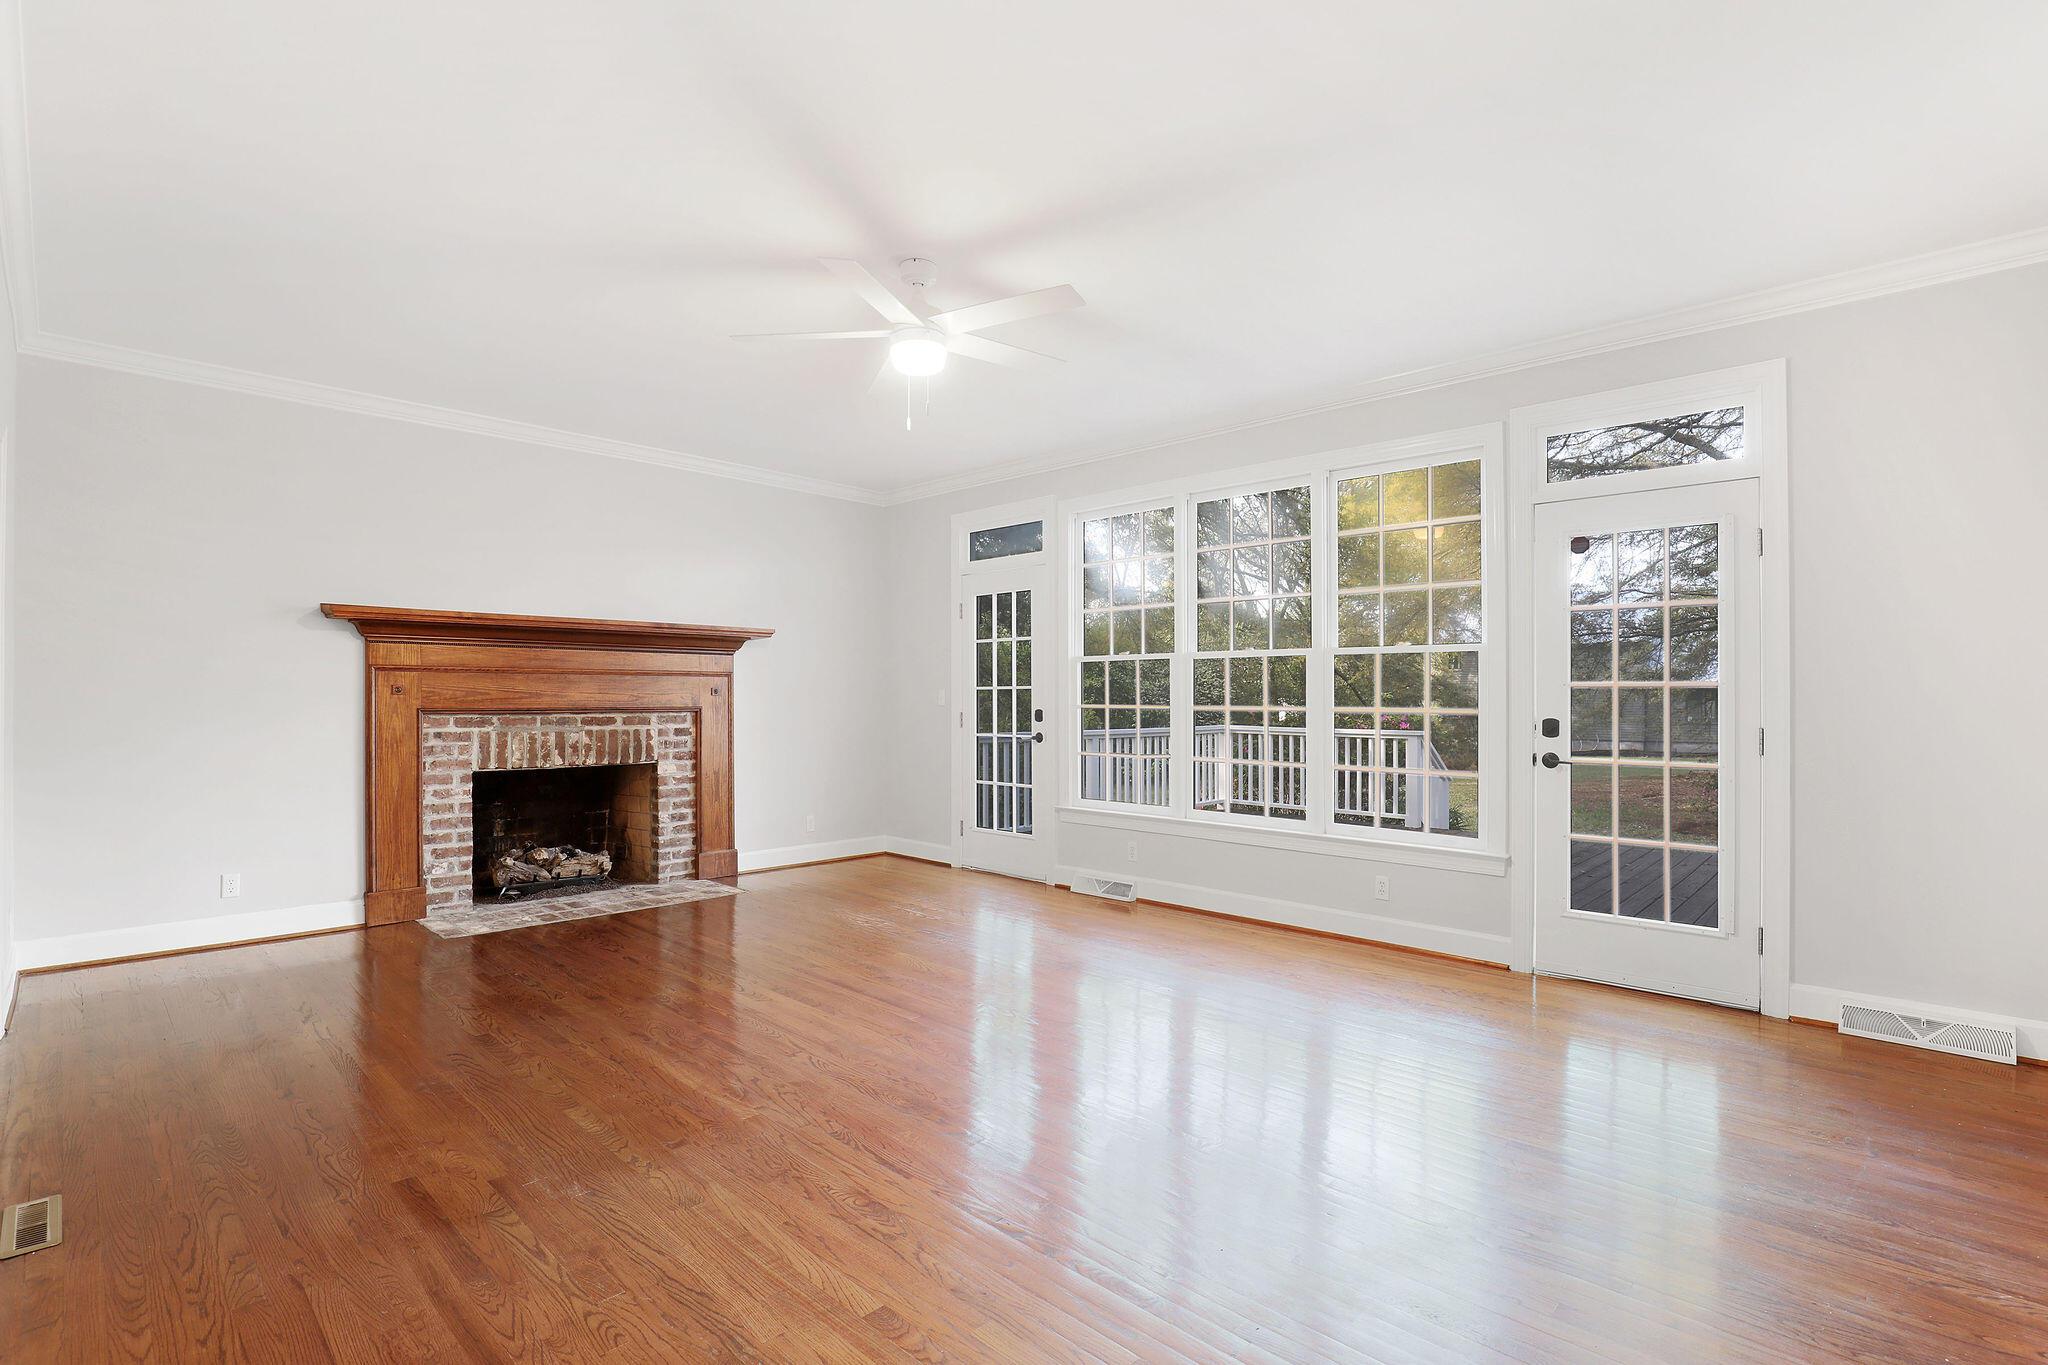 Old Mt Pleasant Homes For Sale - 1417 Edwards, Mount Pleasant, SC - 31